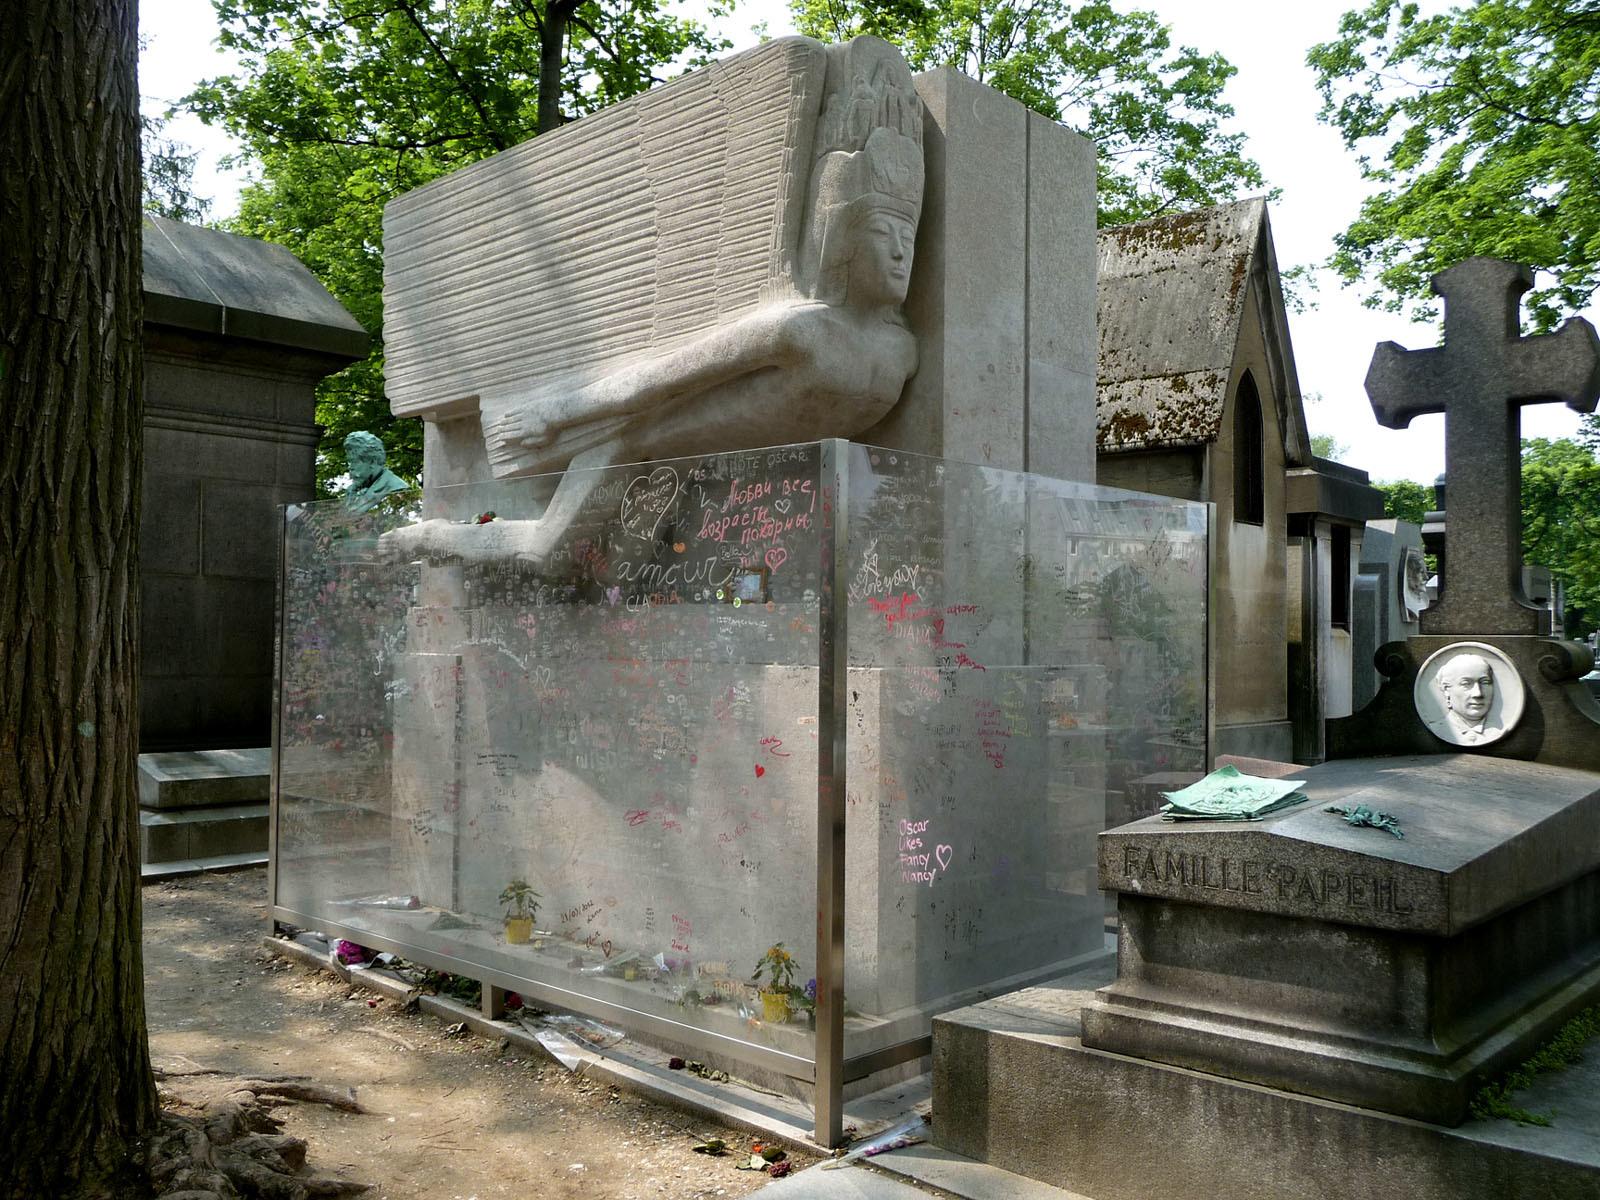 See Oscar Wilde, Jim Morrison and Balzac at peace